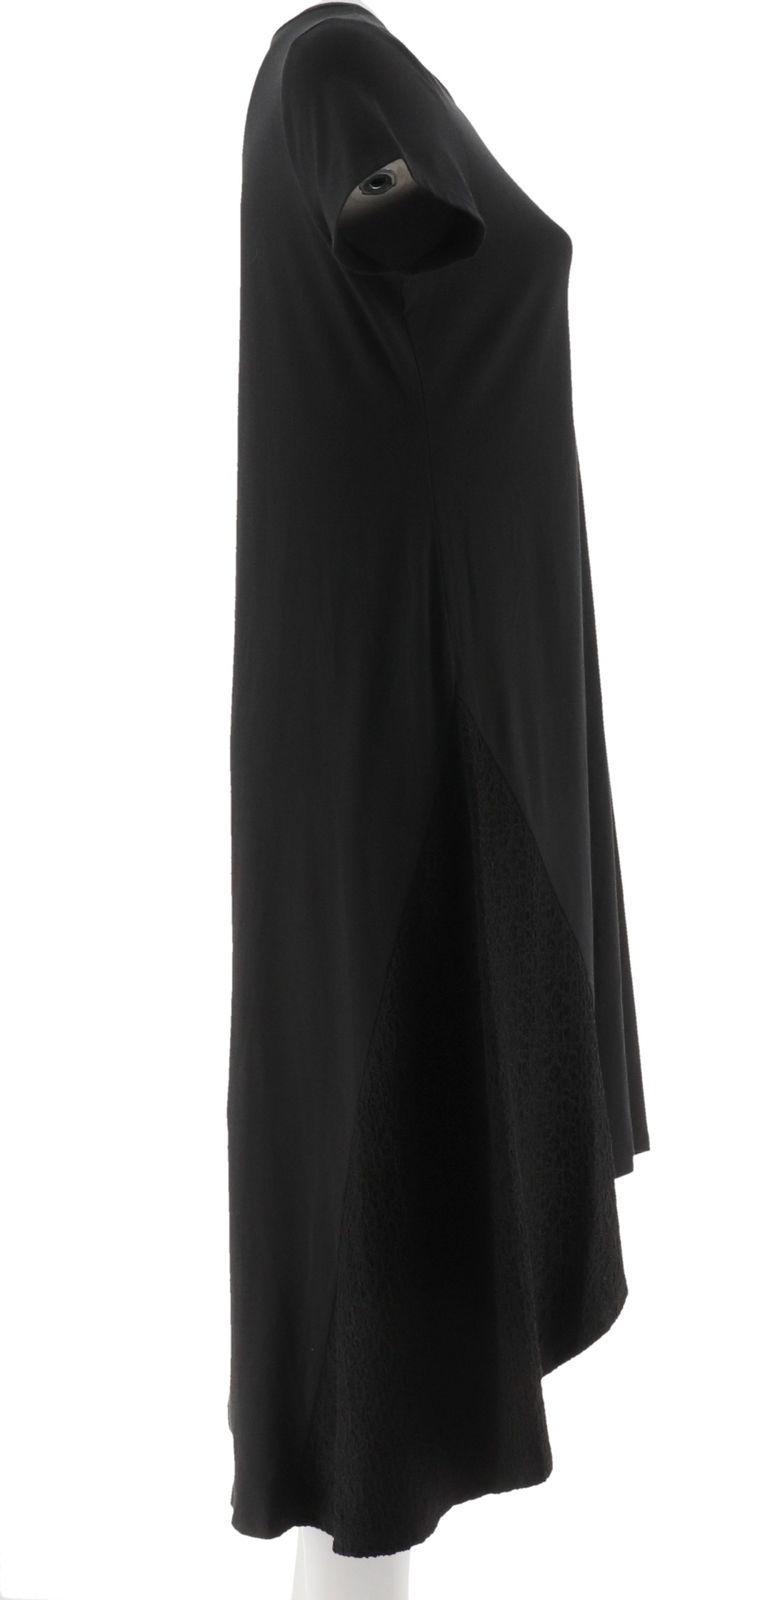 H Halston Scoop Neck Short Slv Maxi Dress Hi-Low Hem Lace Black S NEW A291517